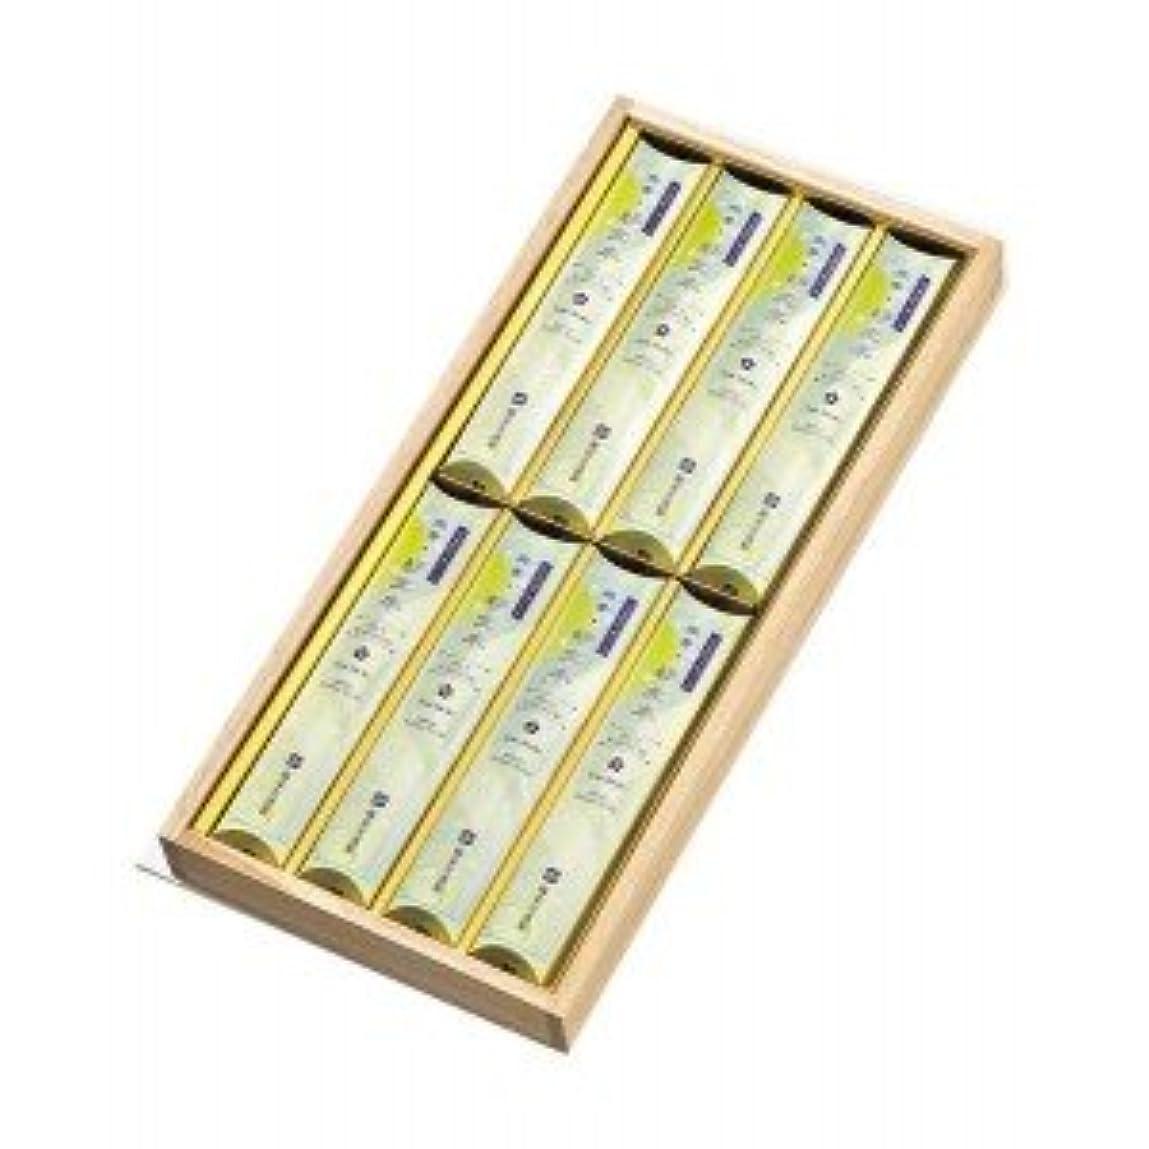 精緻化奇妙な再生可能微煙微香好文木短寸バラ8箱詰桐箱